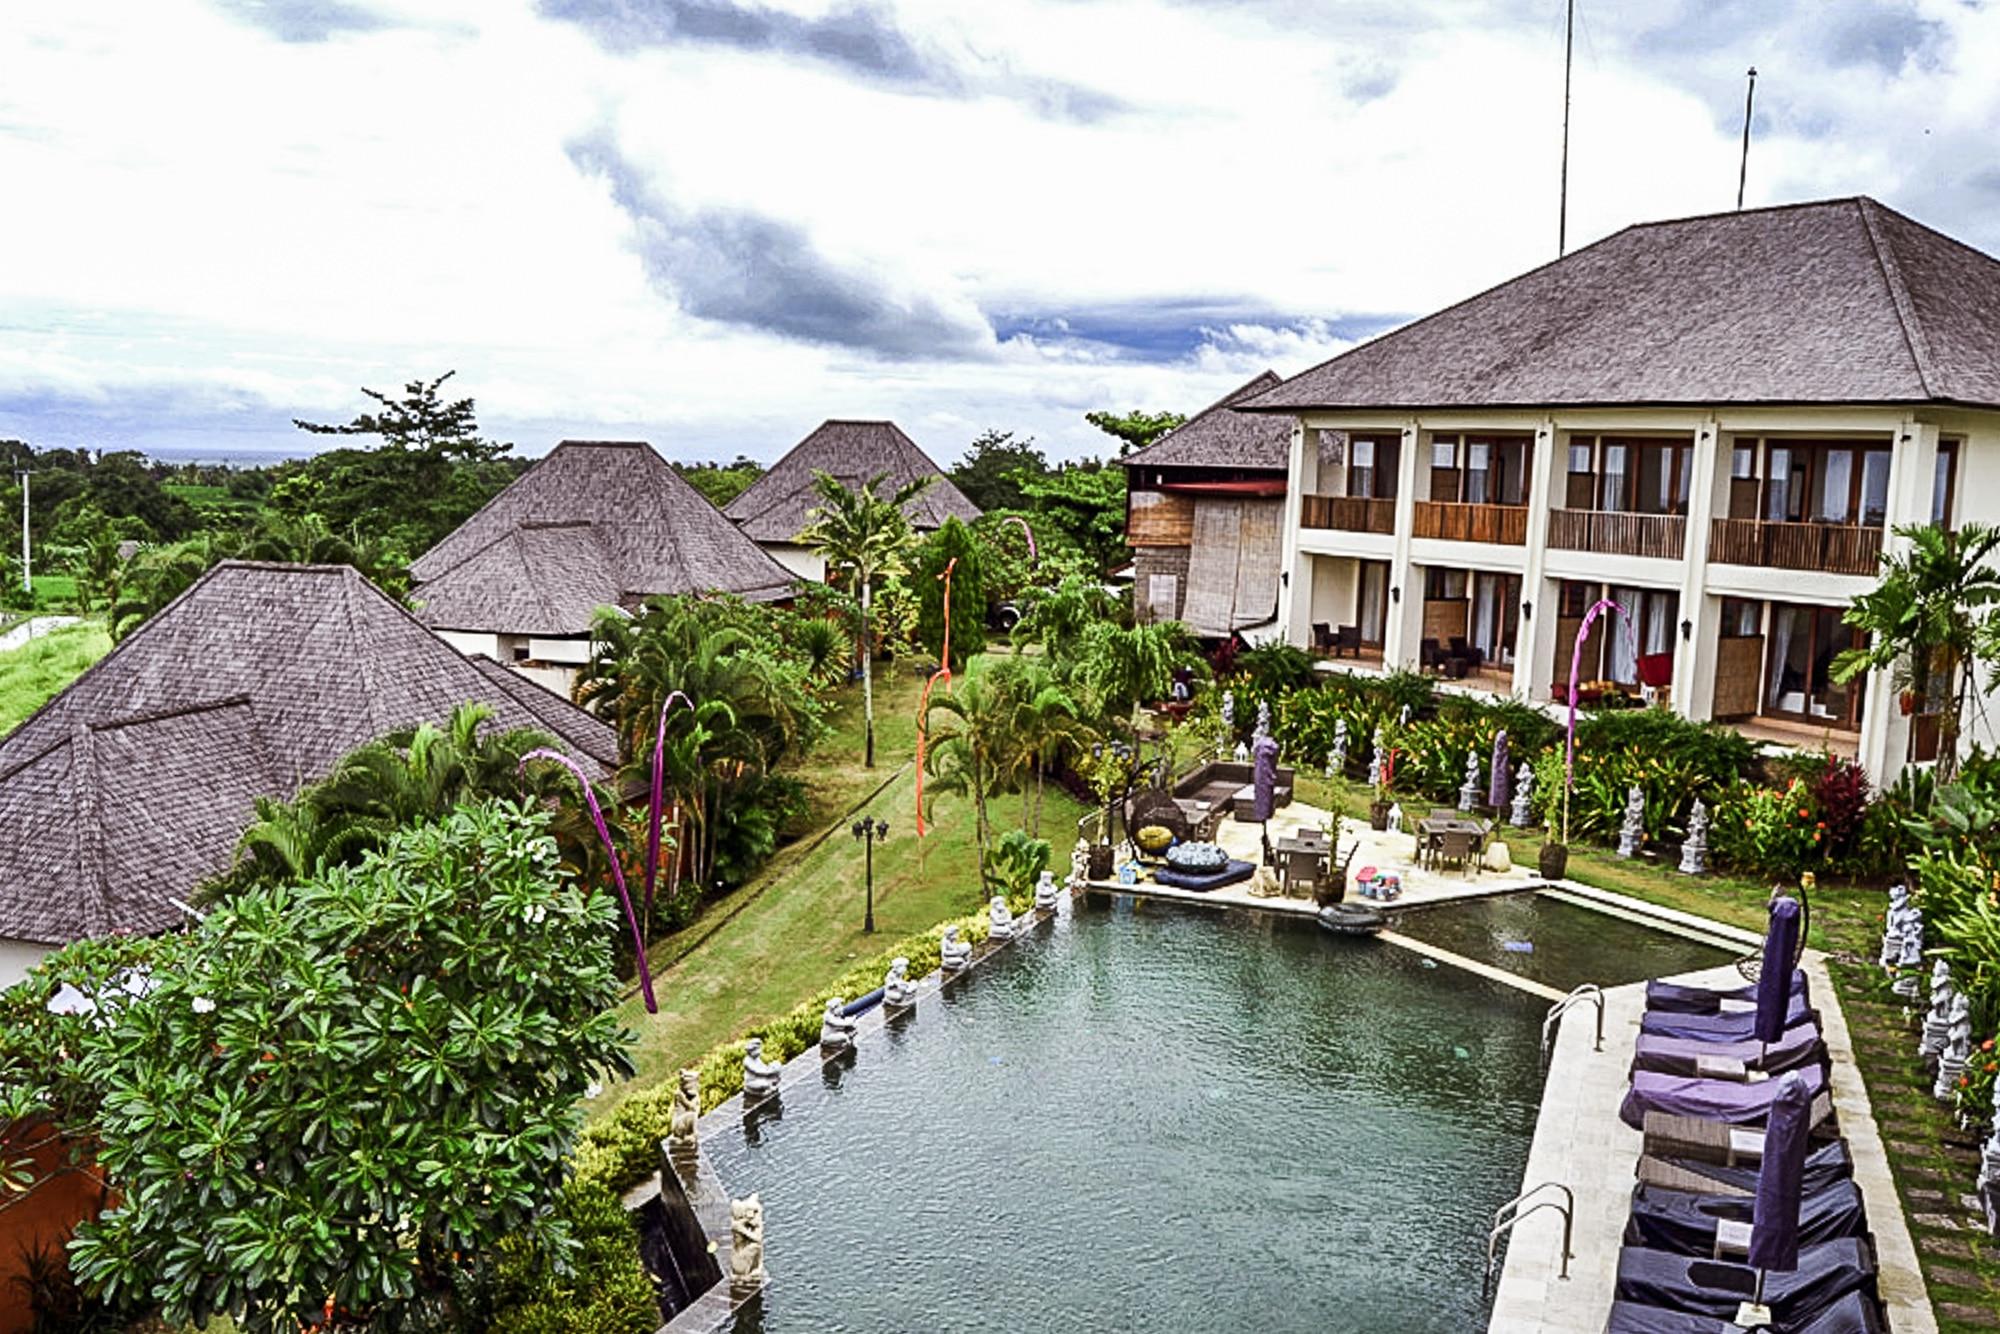 Sahaja Sawah Resort Bali Review - mein Erfahrungsbericht